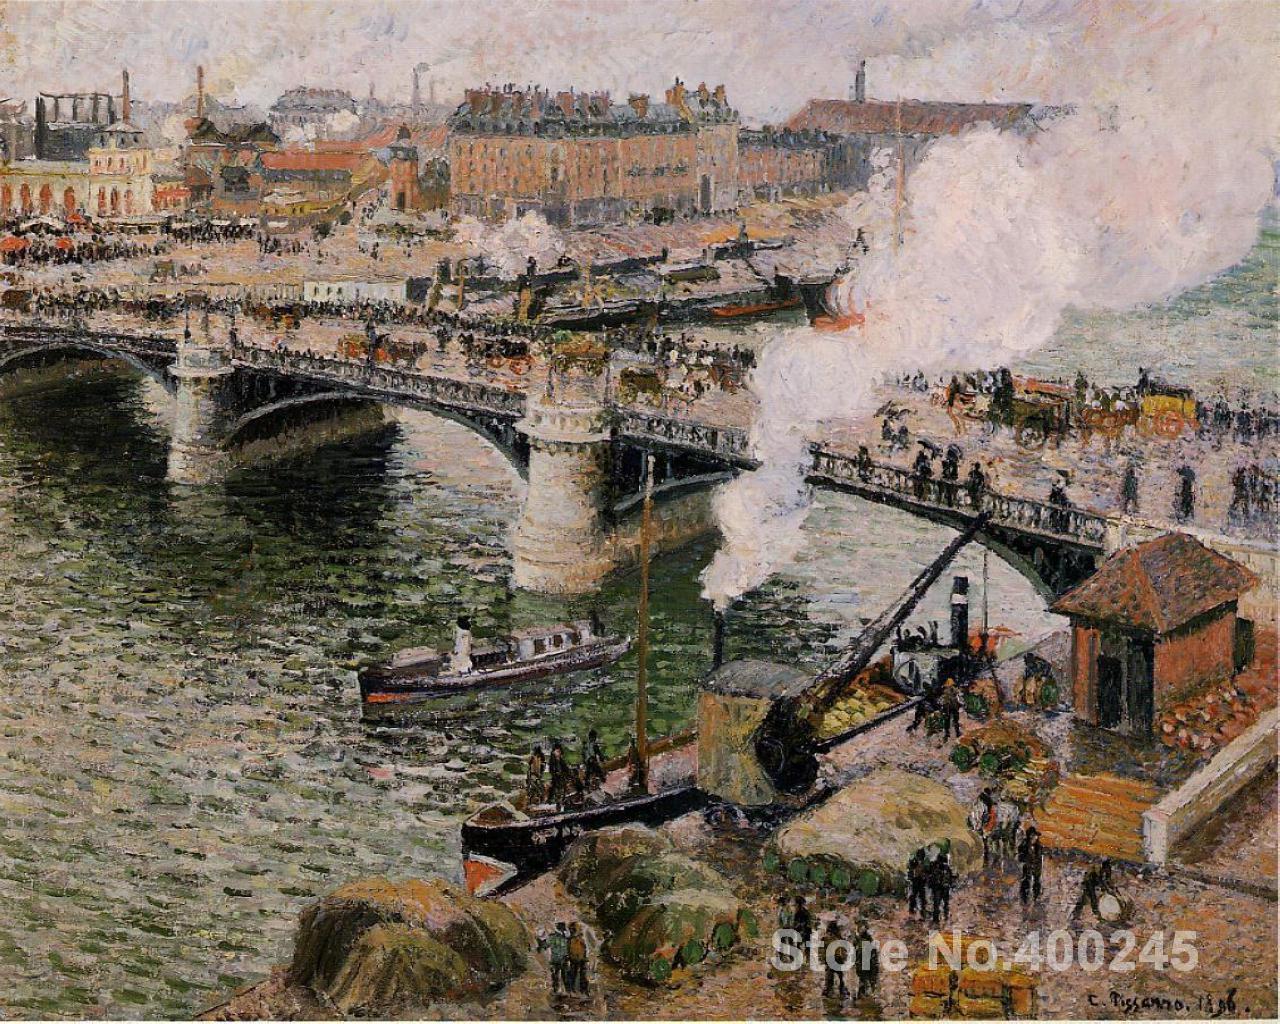 Reproducción de arte en lienzo The Pont Boieldieu, Rouen, pinturas con clima húmedo de Camile Pissarro a la venta pintado a mano de alta calidad